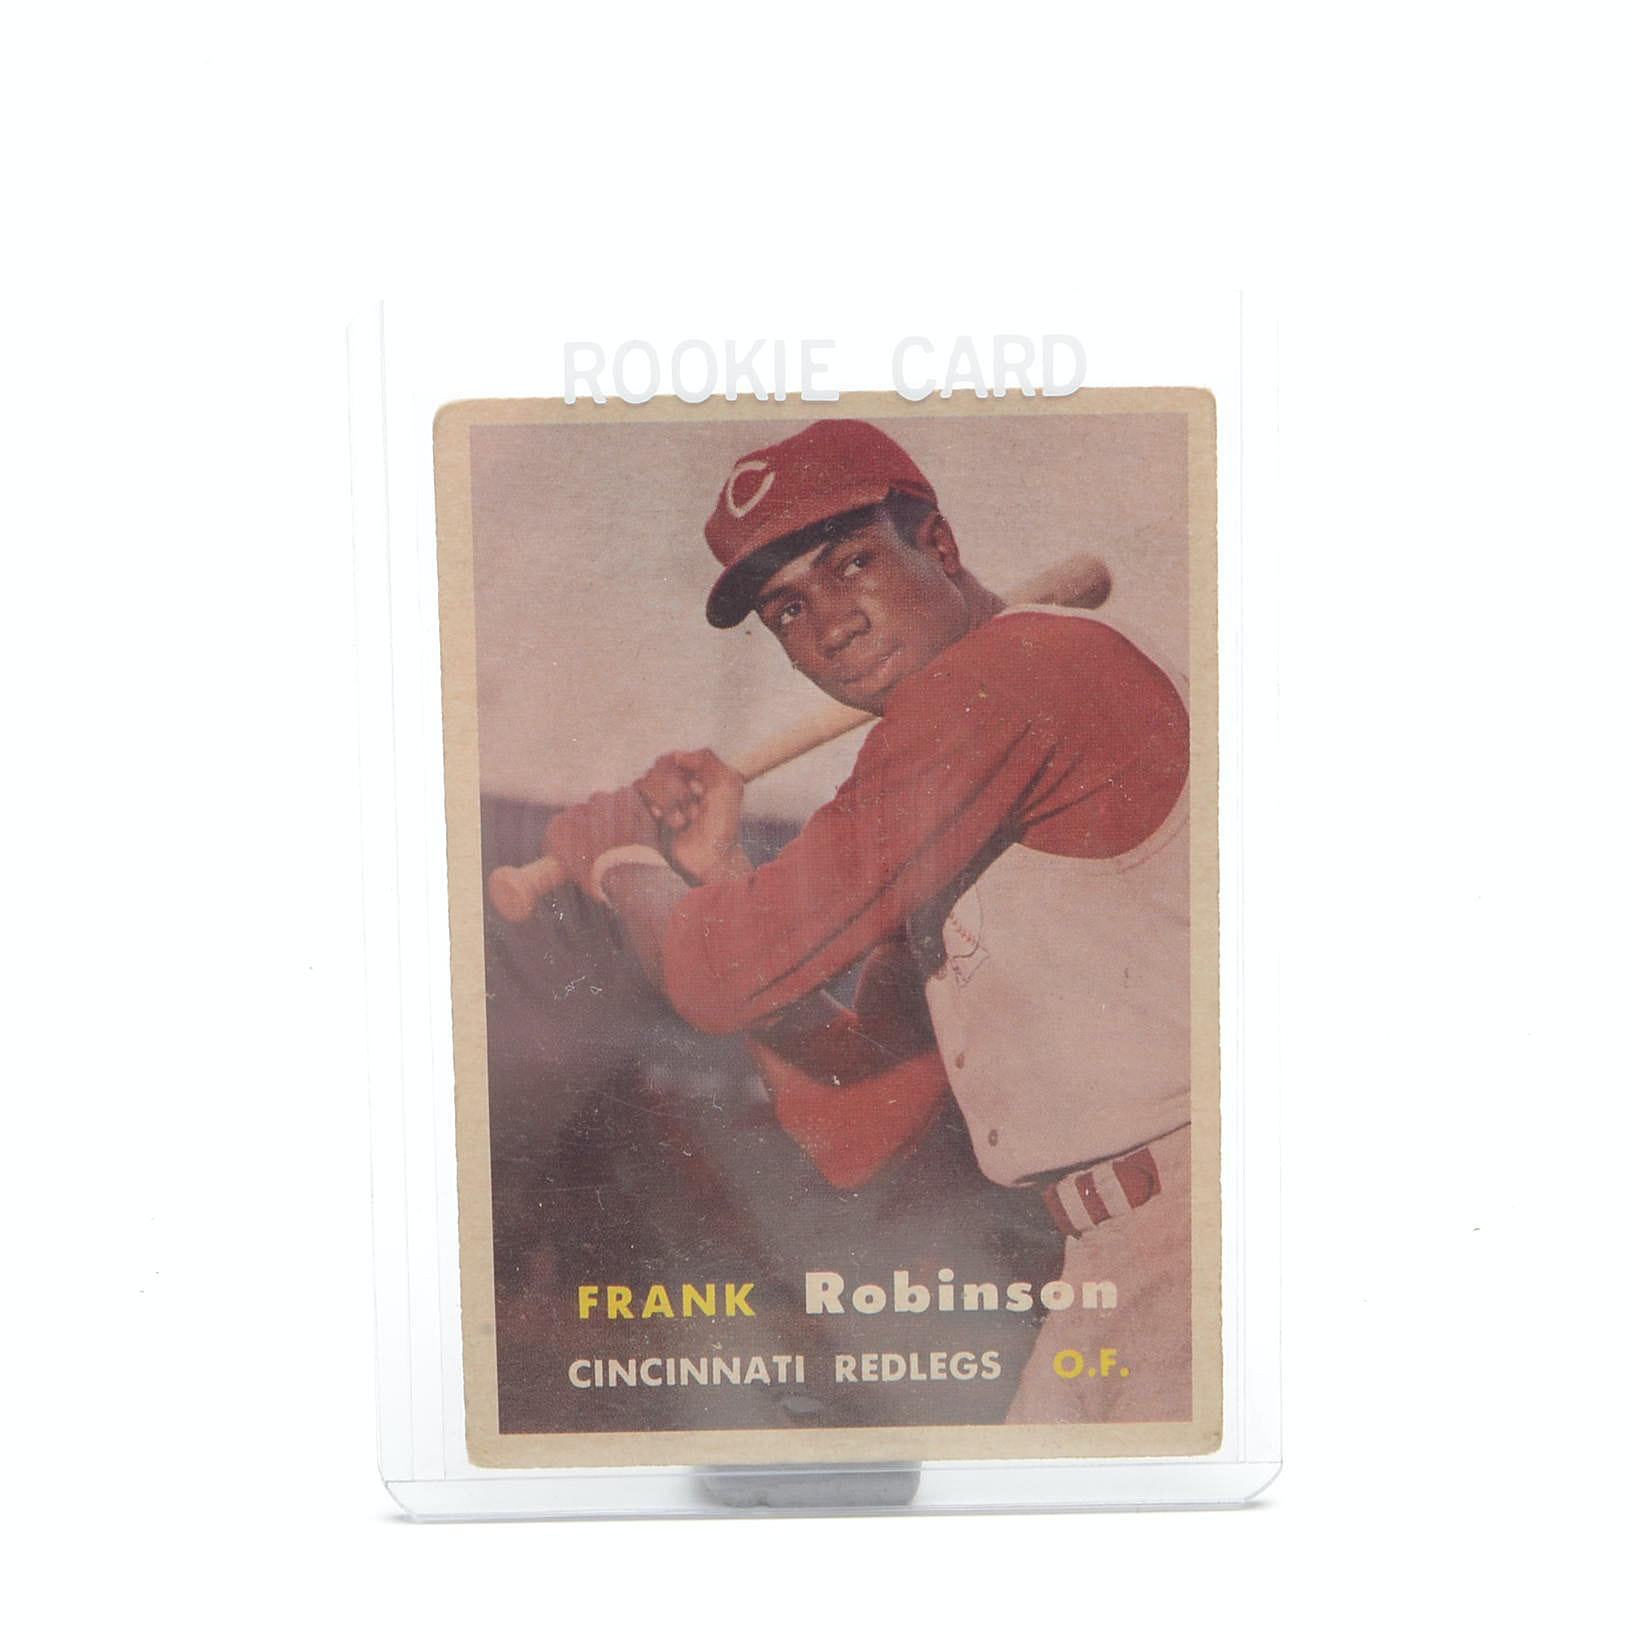 1957 Frank Robinson Reds Topps Rookie Baseball Card